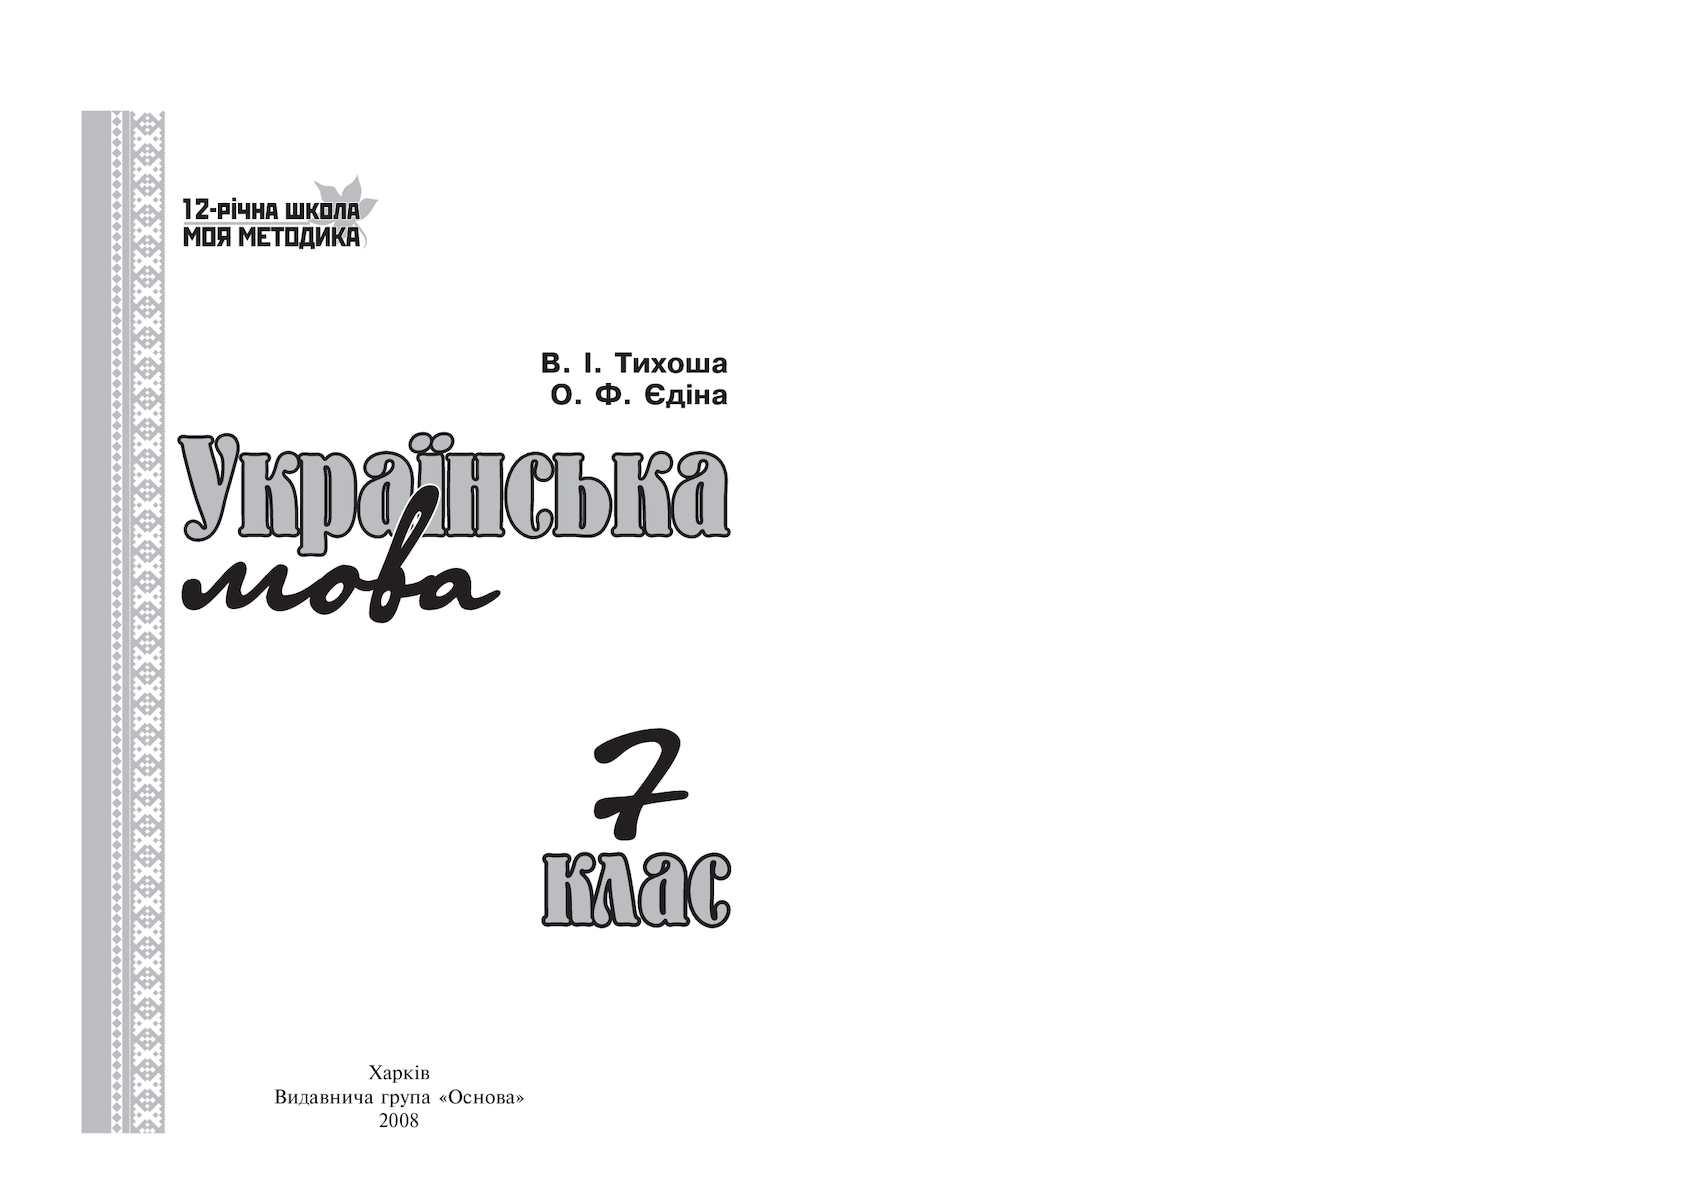 Calaméo - Tihosha V I Ukrainska Mova 7 Klas d3b68b7062f37